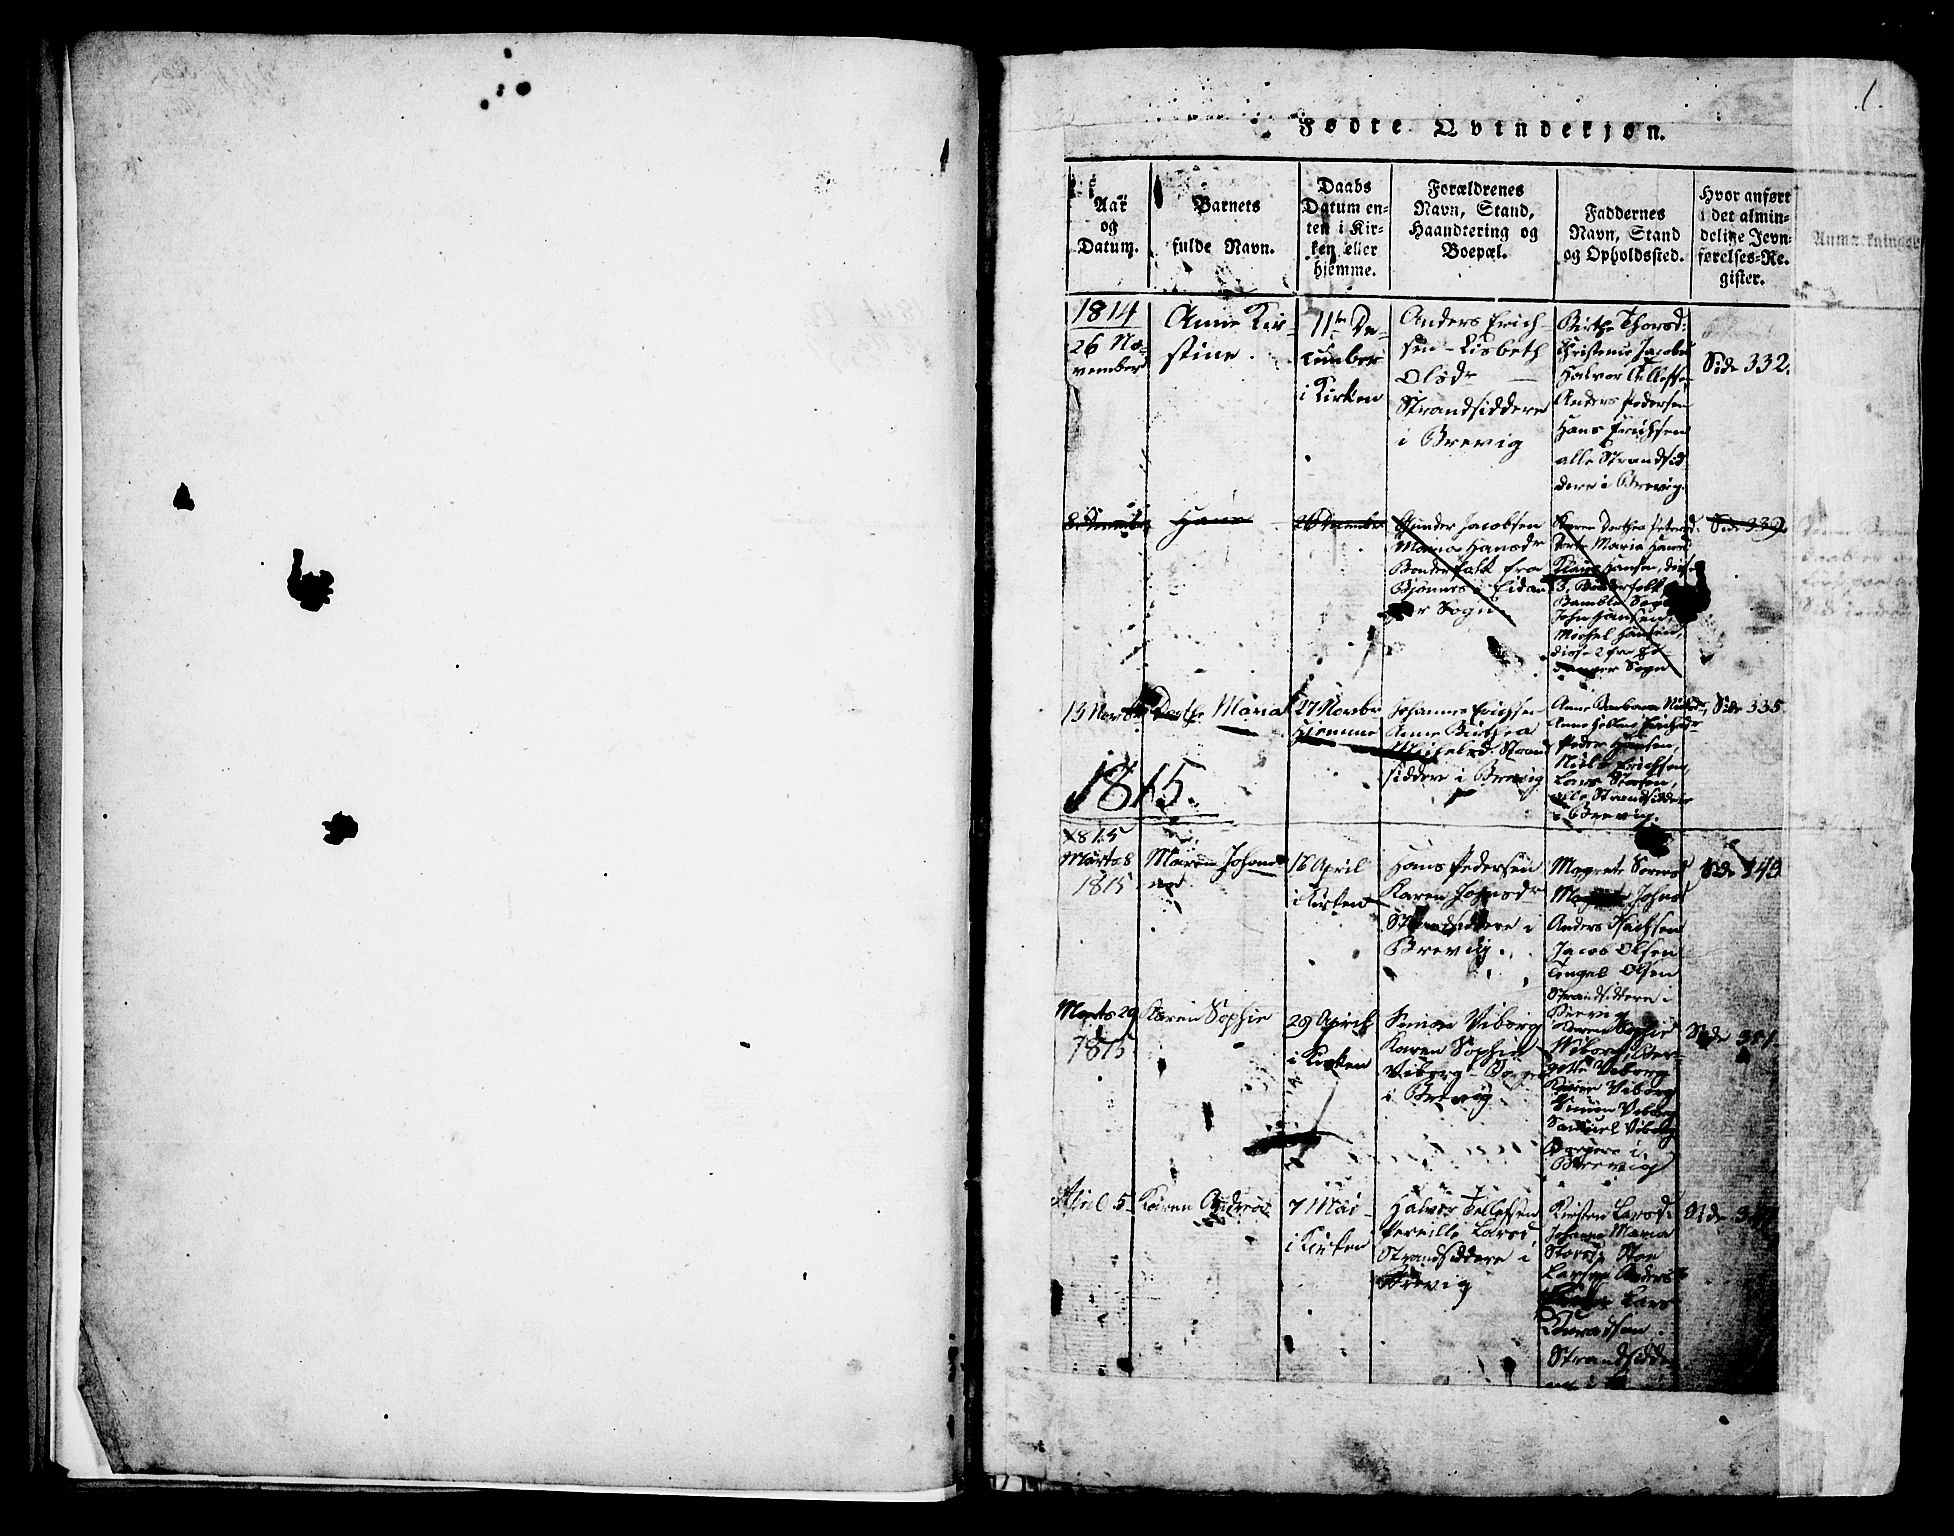 SAKO, Brevik kirkebøker, G/Ga/L0001: Klokkerbok nr. 1, 1814-1845, s. 1